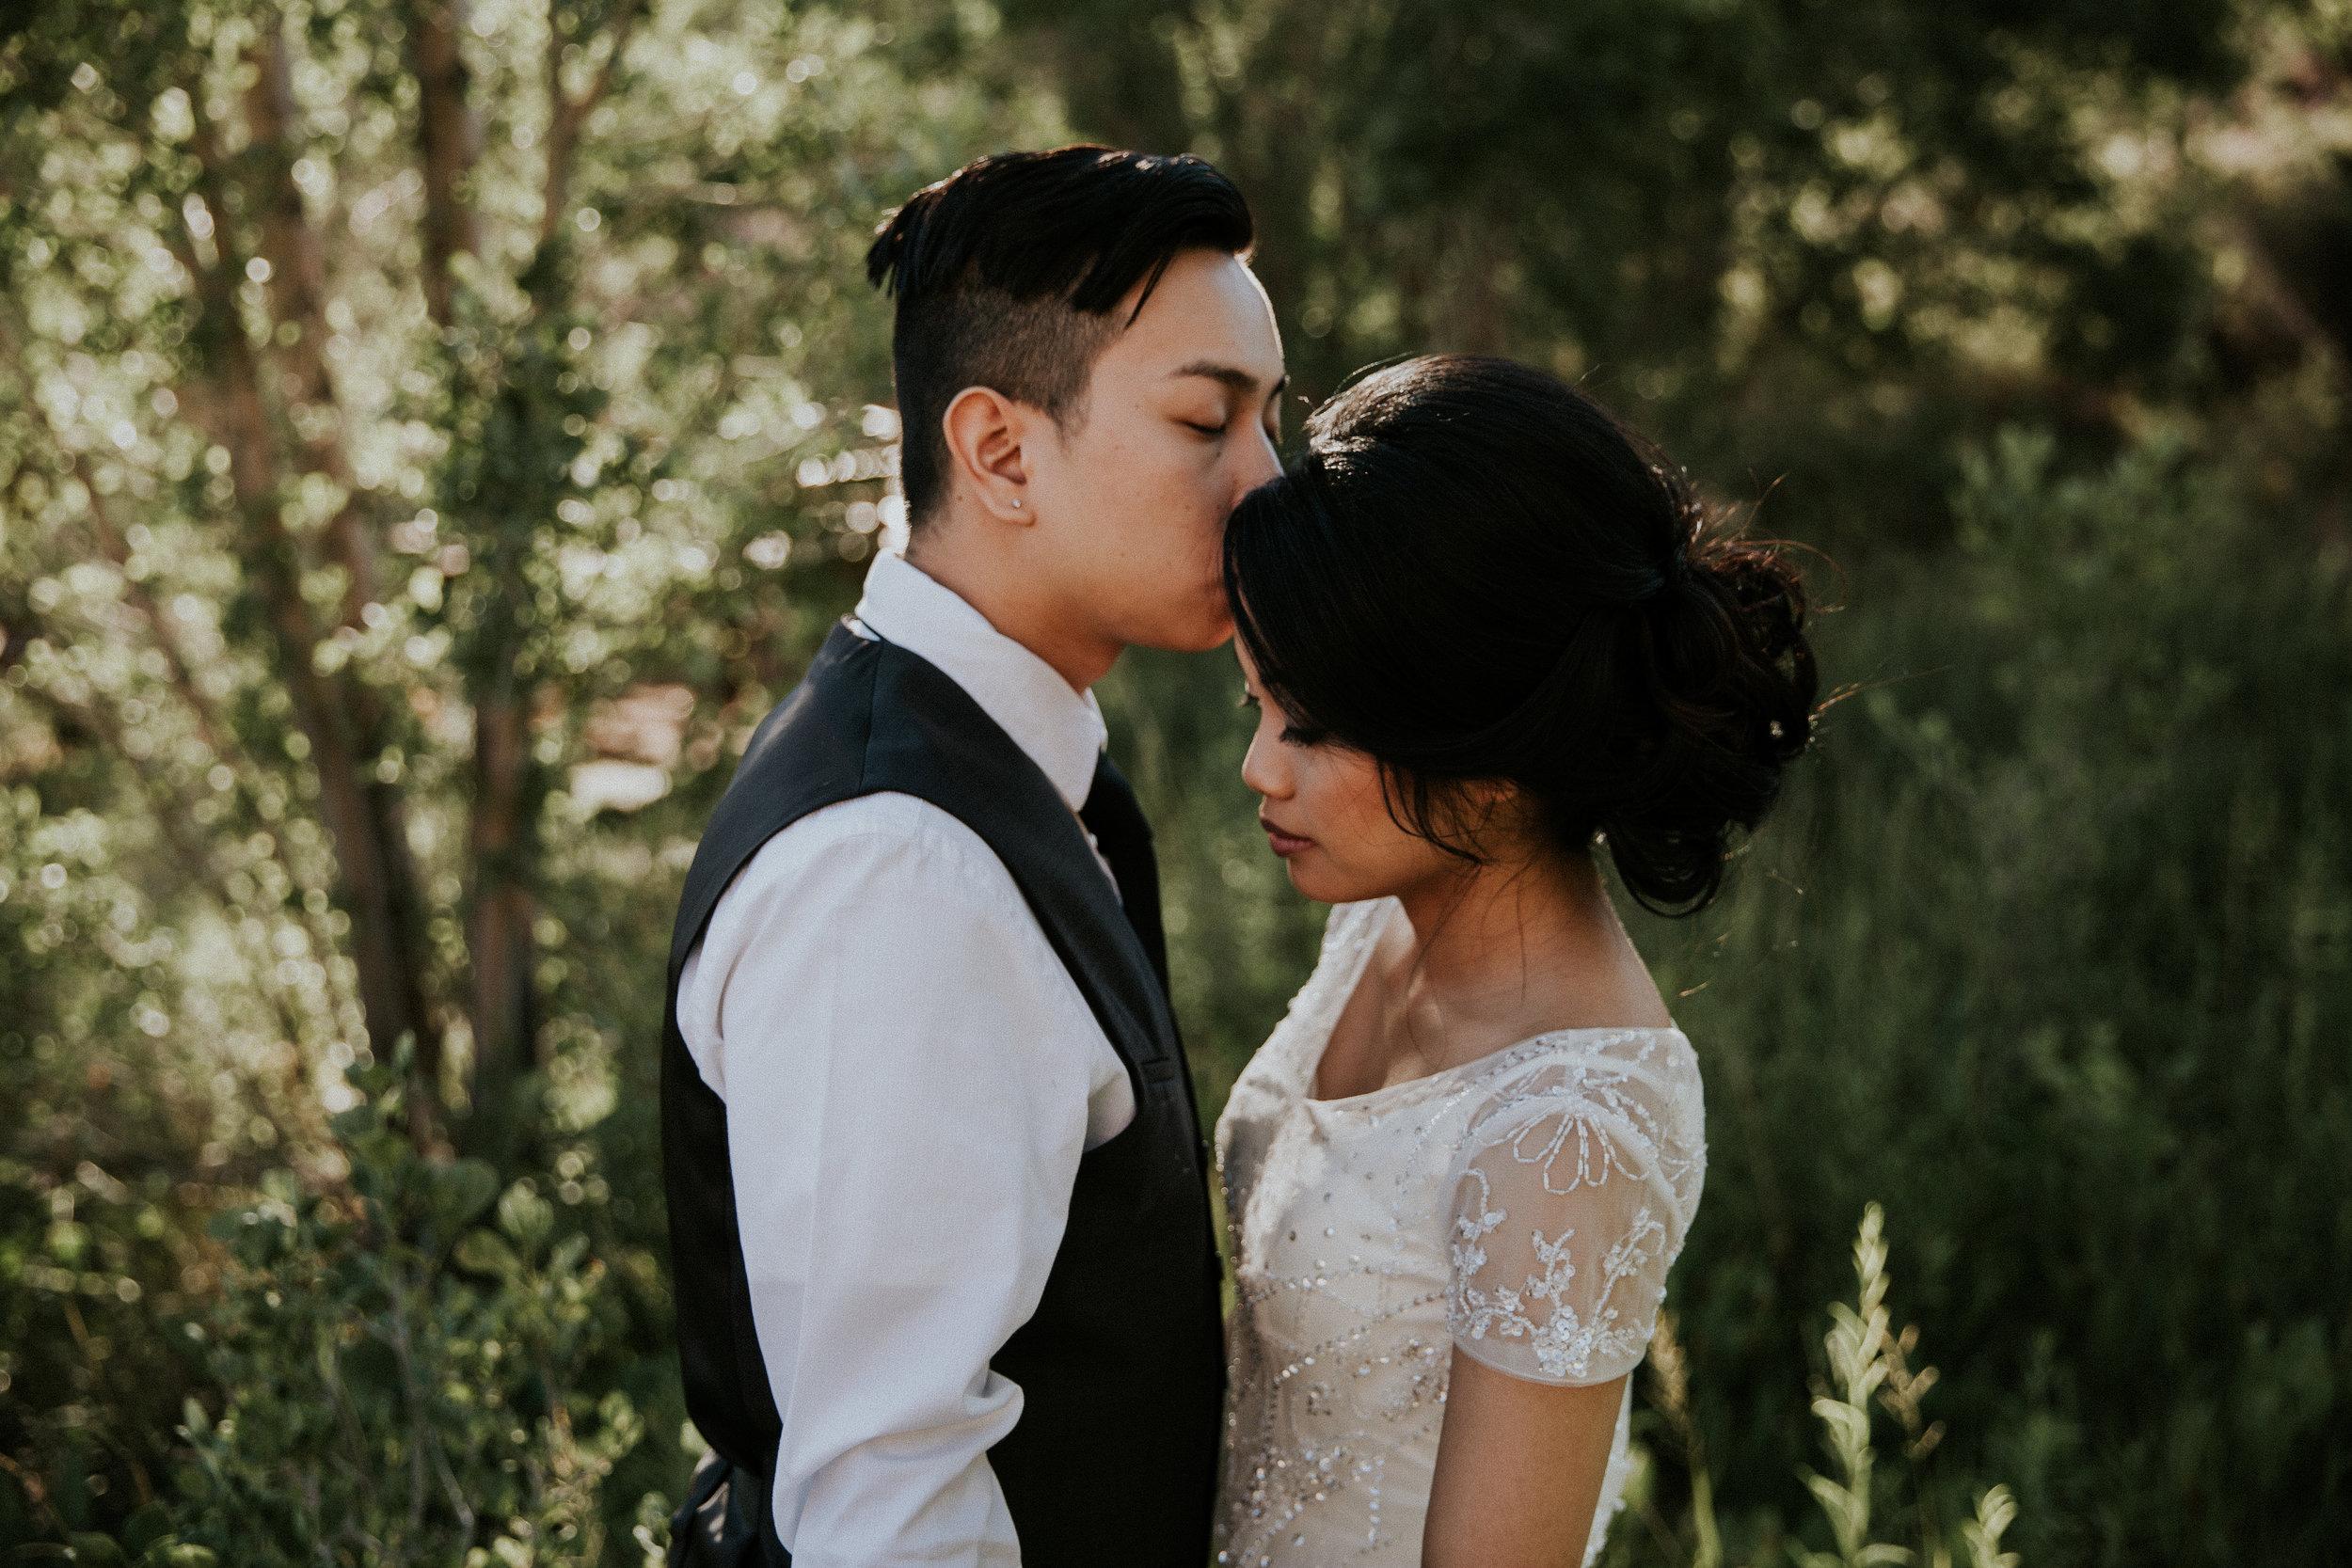 AJ + Kittichai - First Look - Wedding Day - Seattle Wedding Photographer - Washington Elopement Photographer - Seattle Engagement Photographer - Seattle Photographer